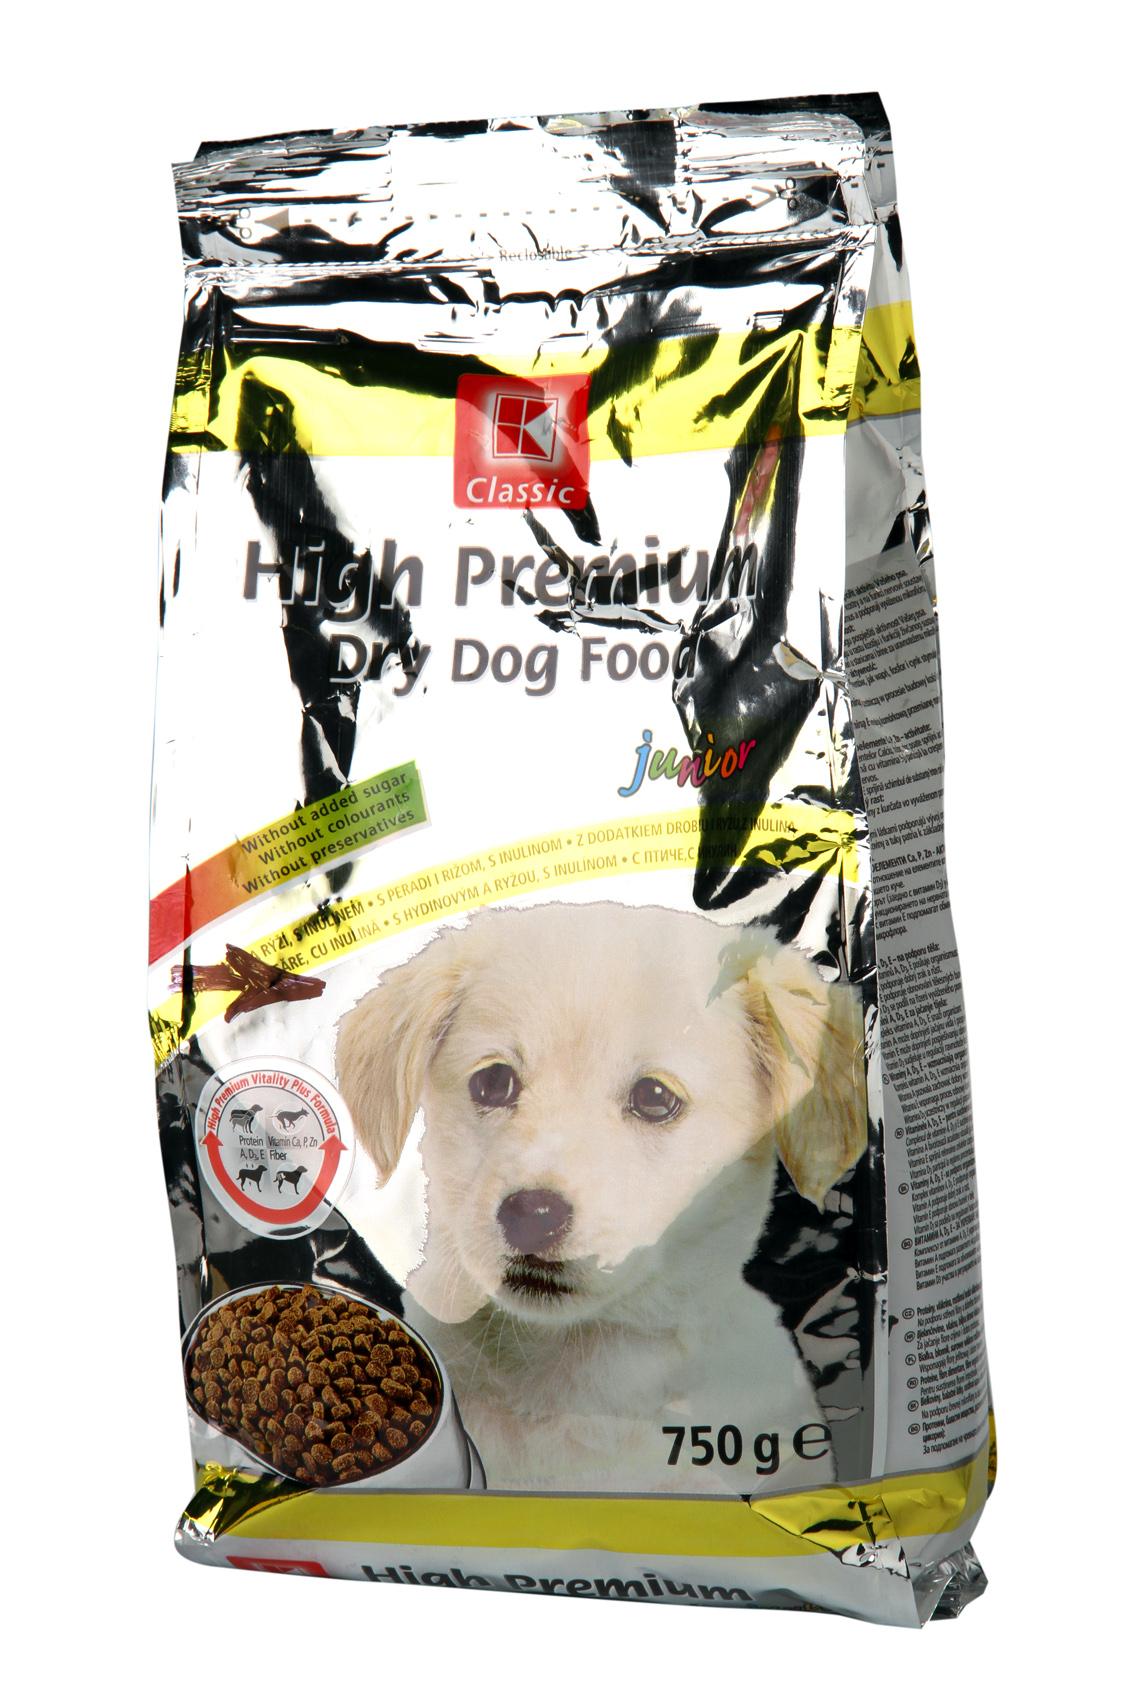 High Premium Dry Dog Food